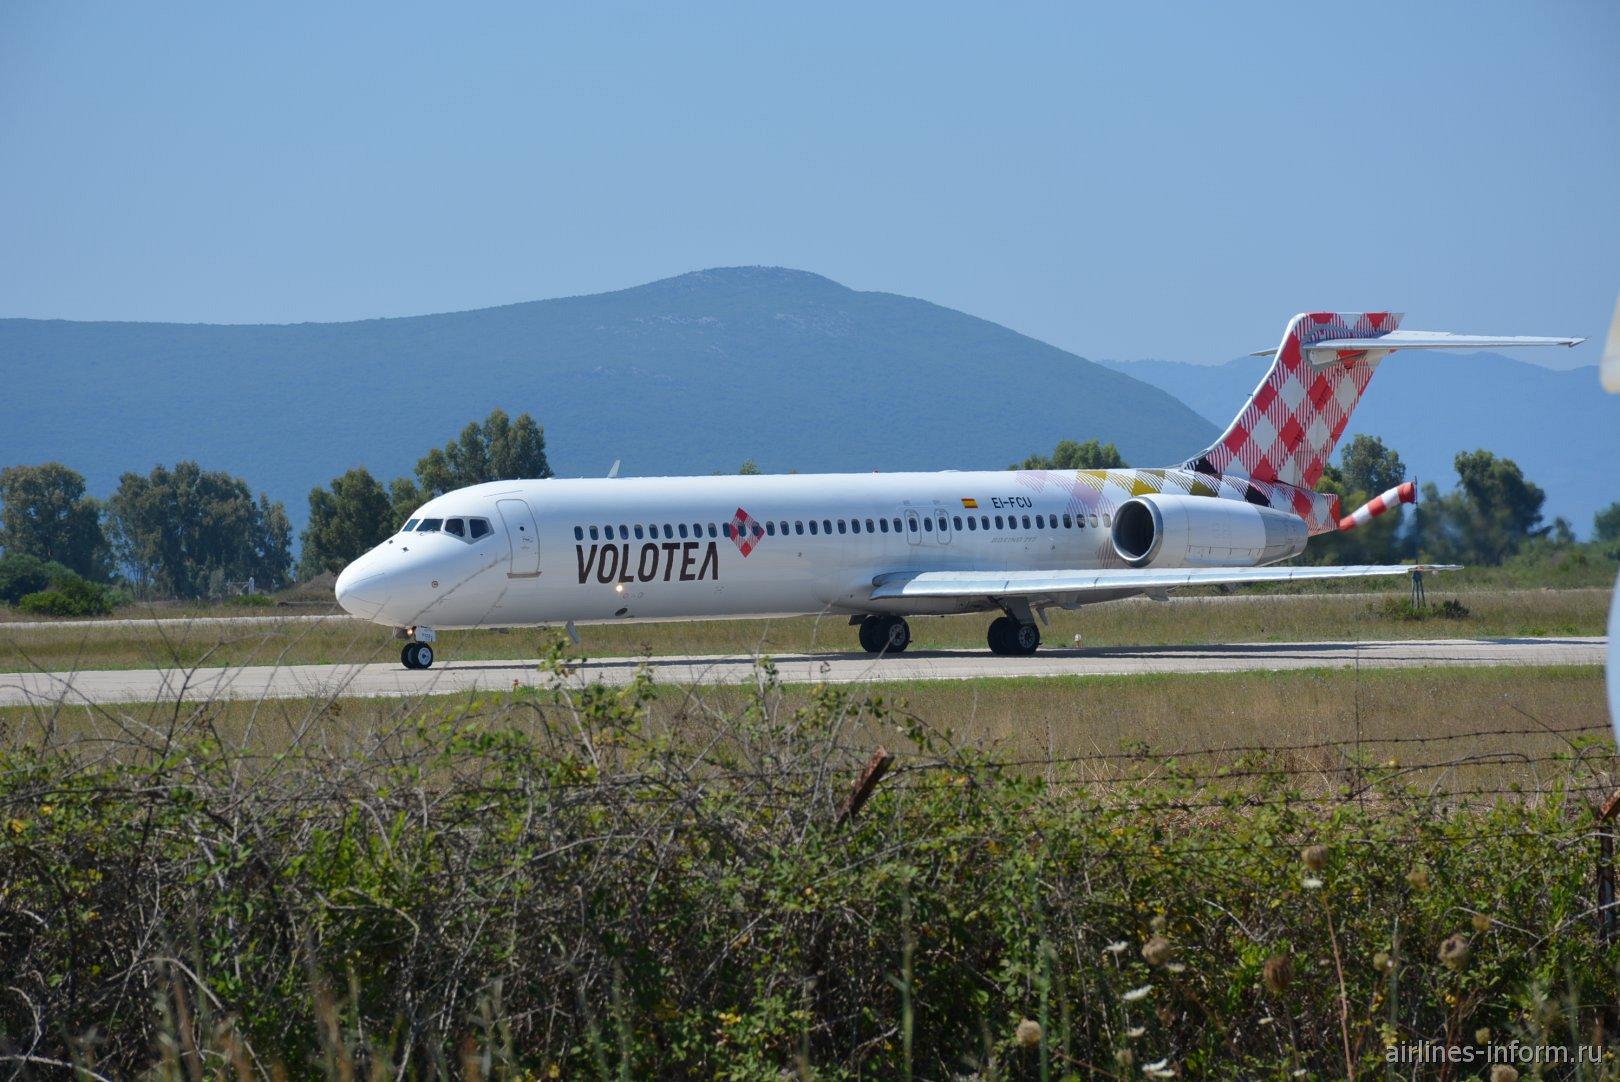 Самолет Боинг-717 авиакомпании Volotea в аэропорту Превеза